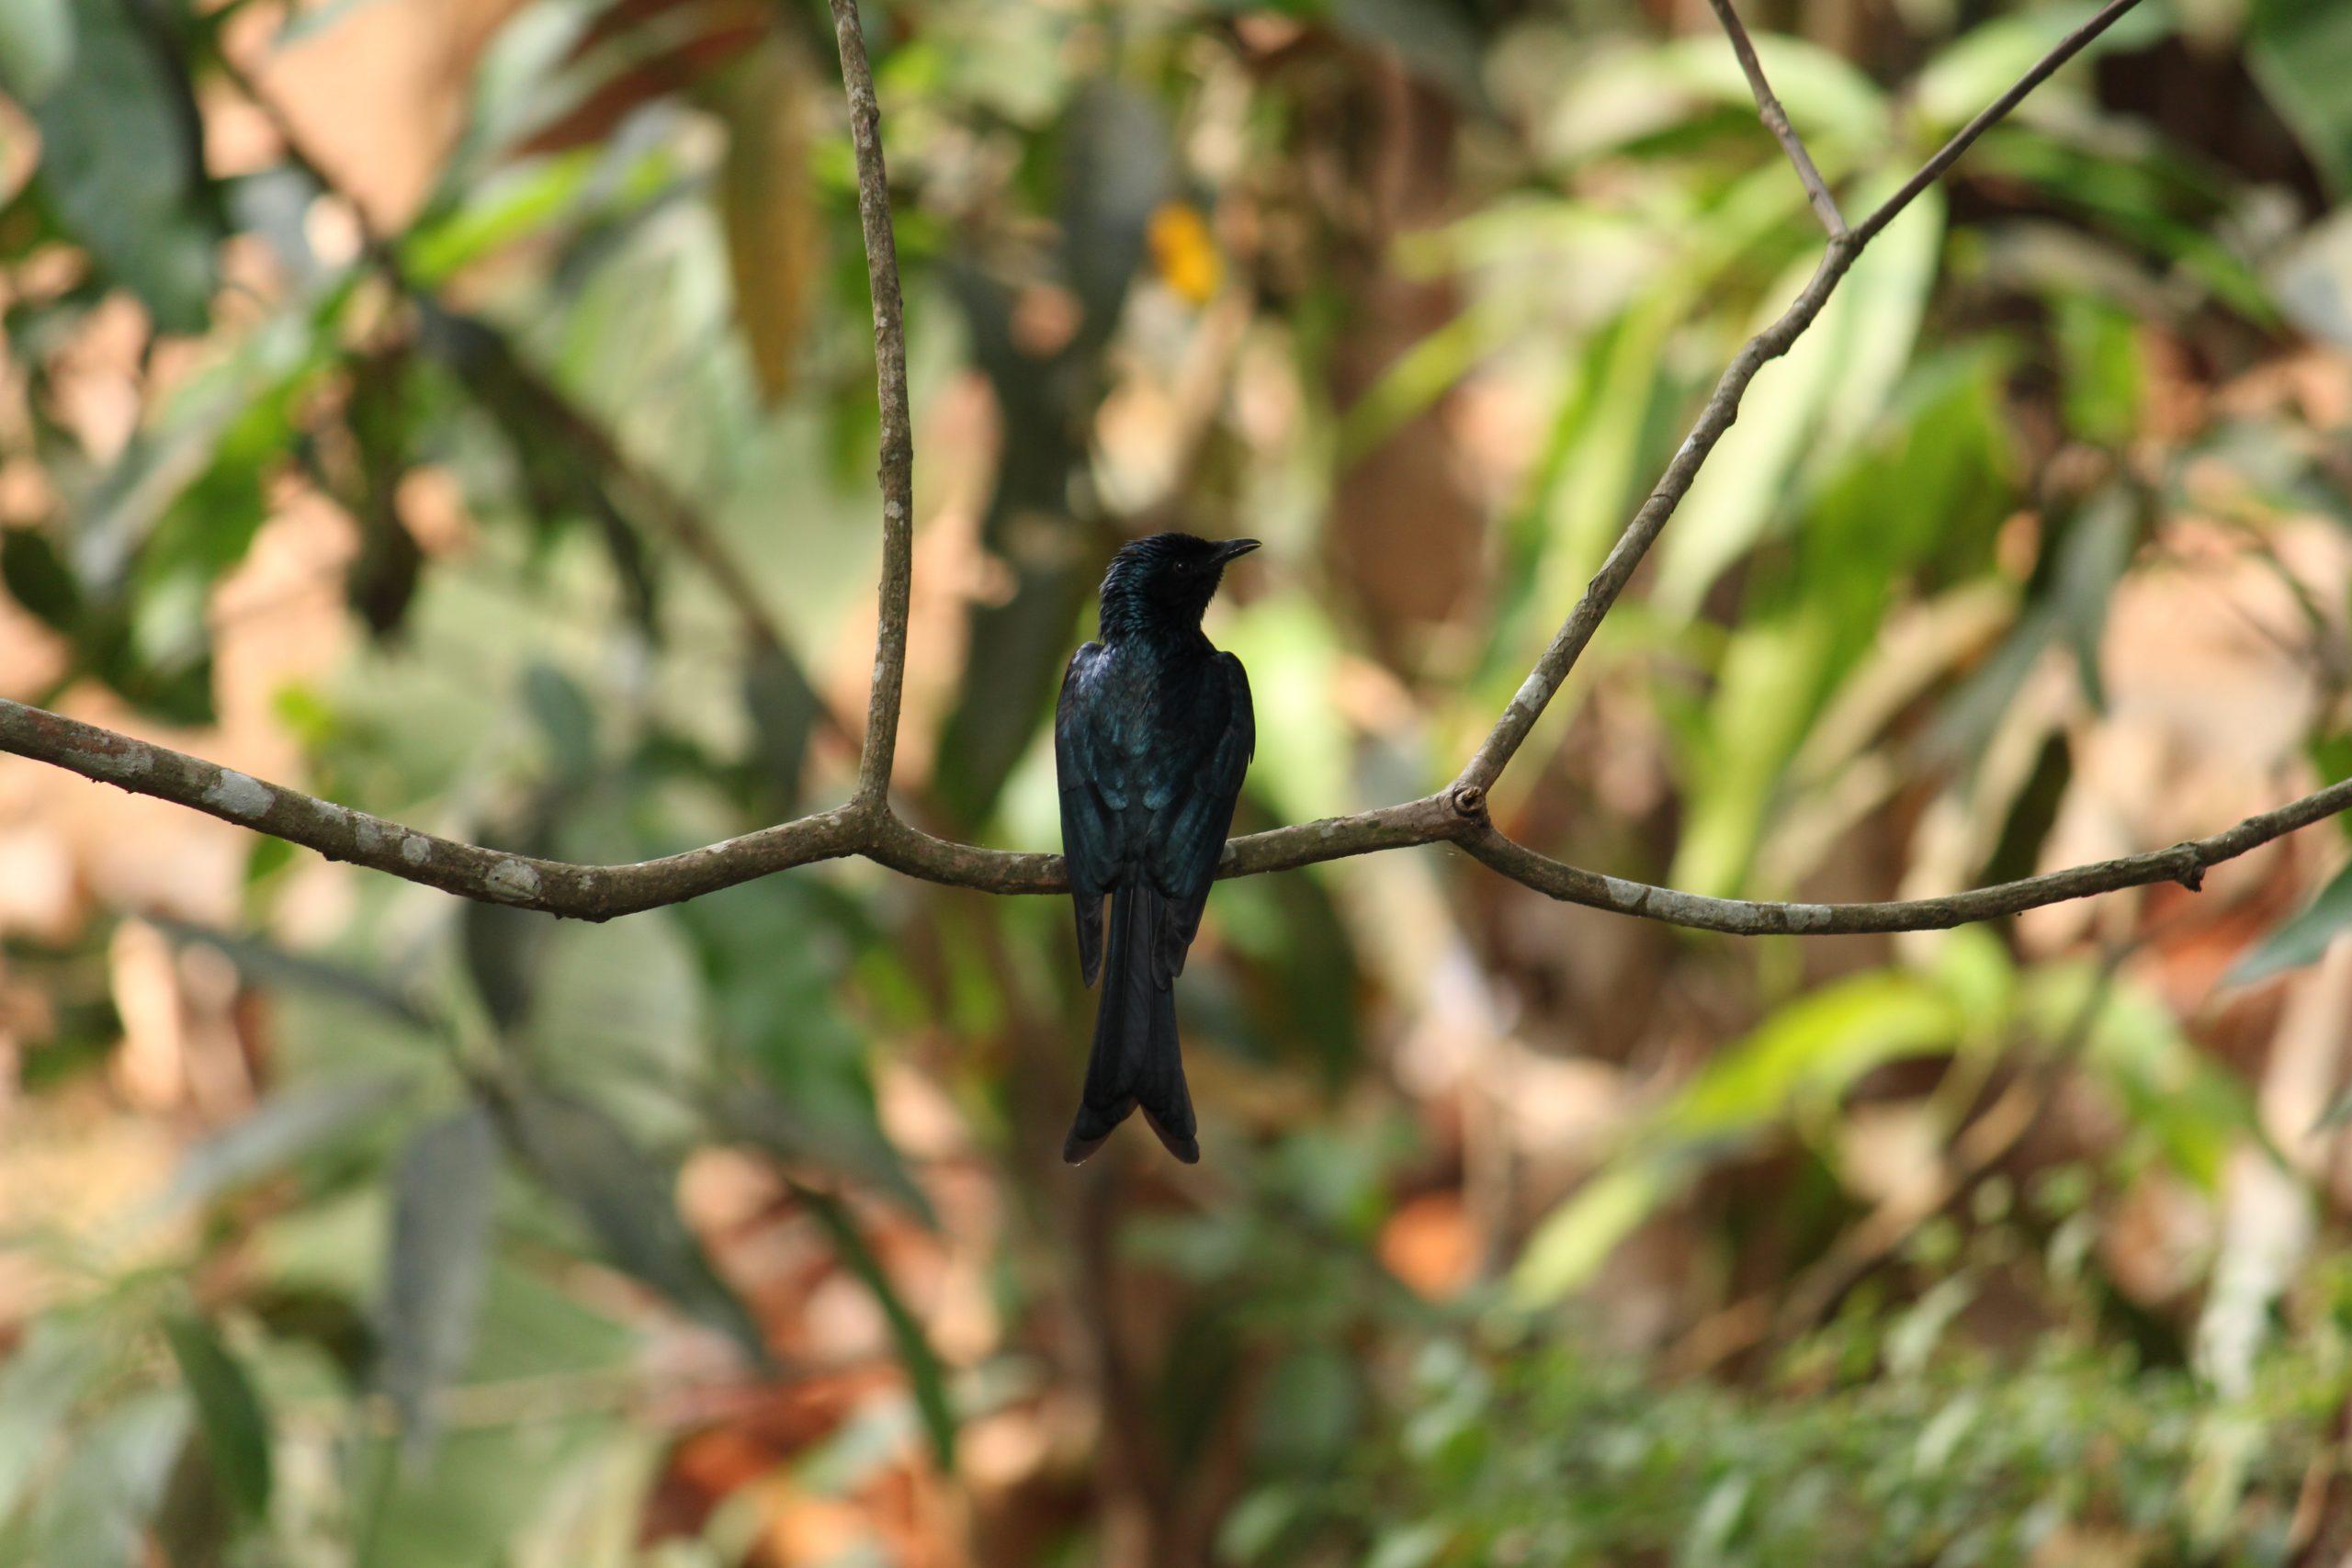 A bird sitting on a tree branch